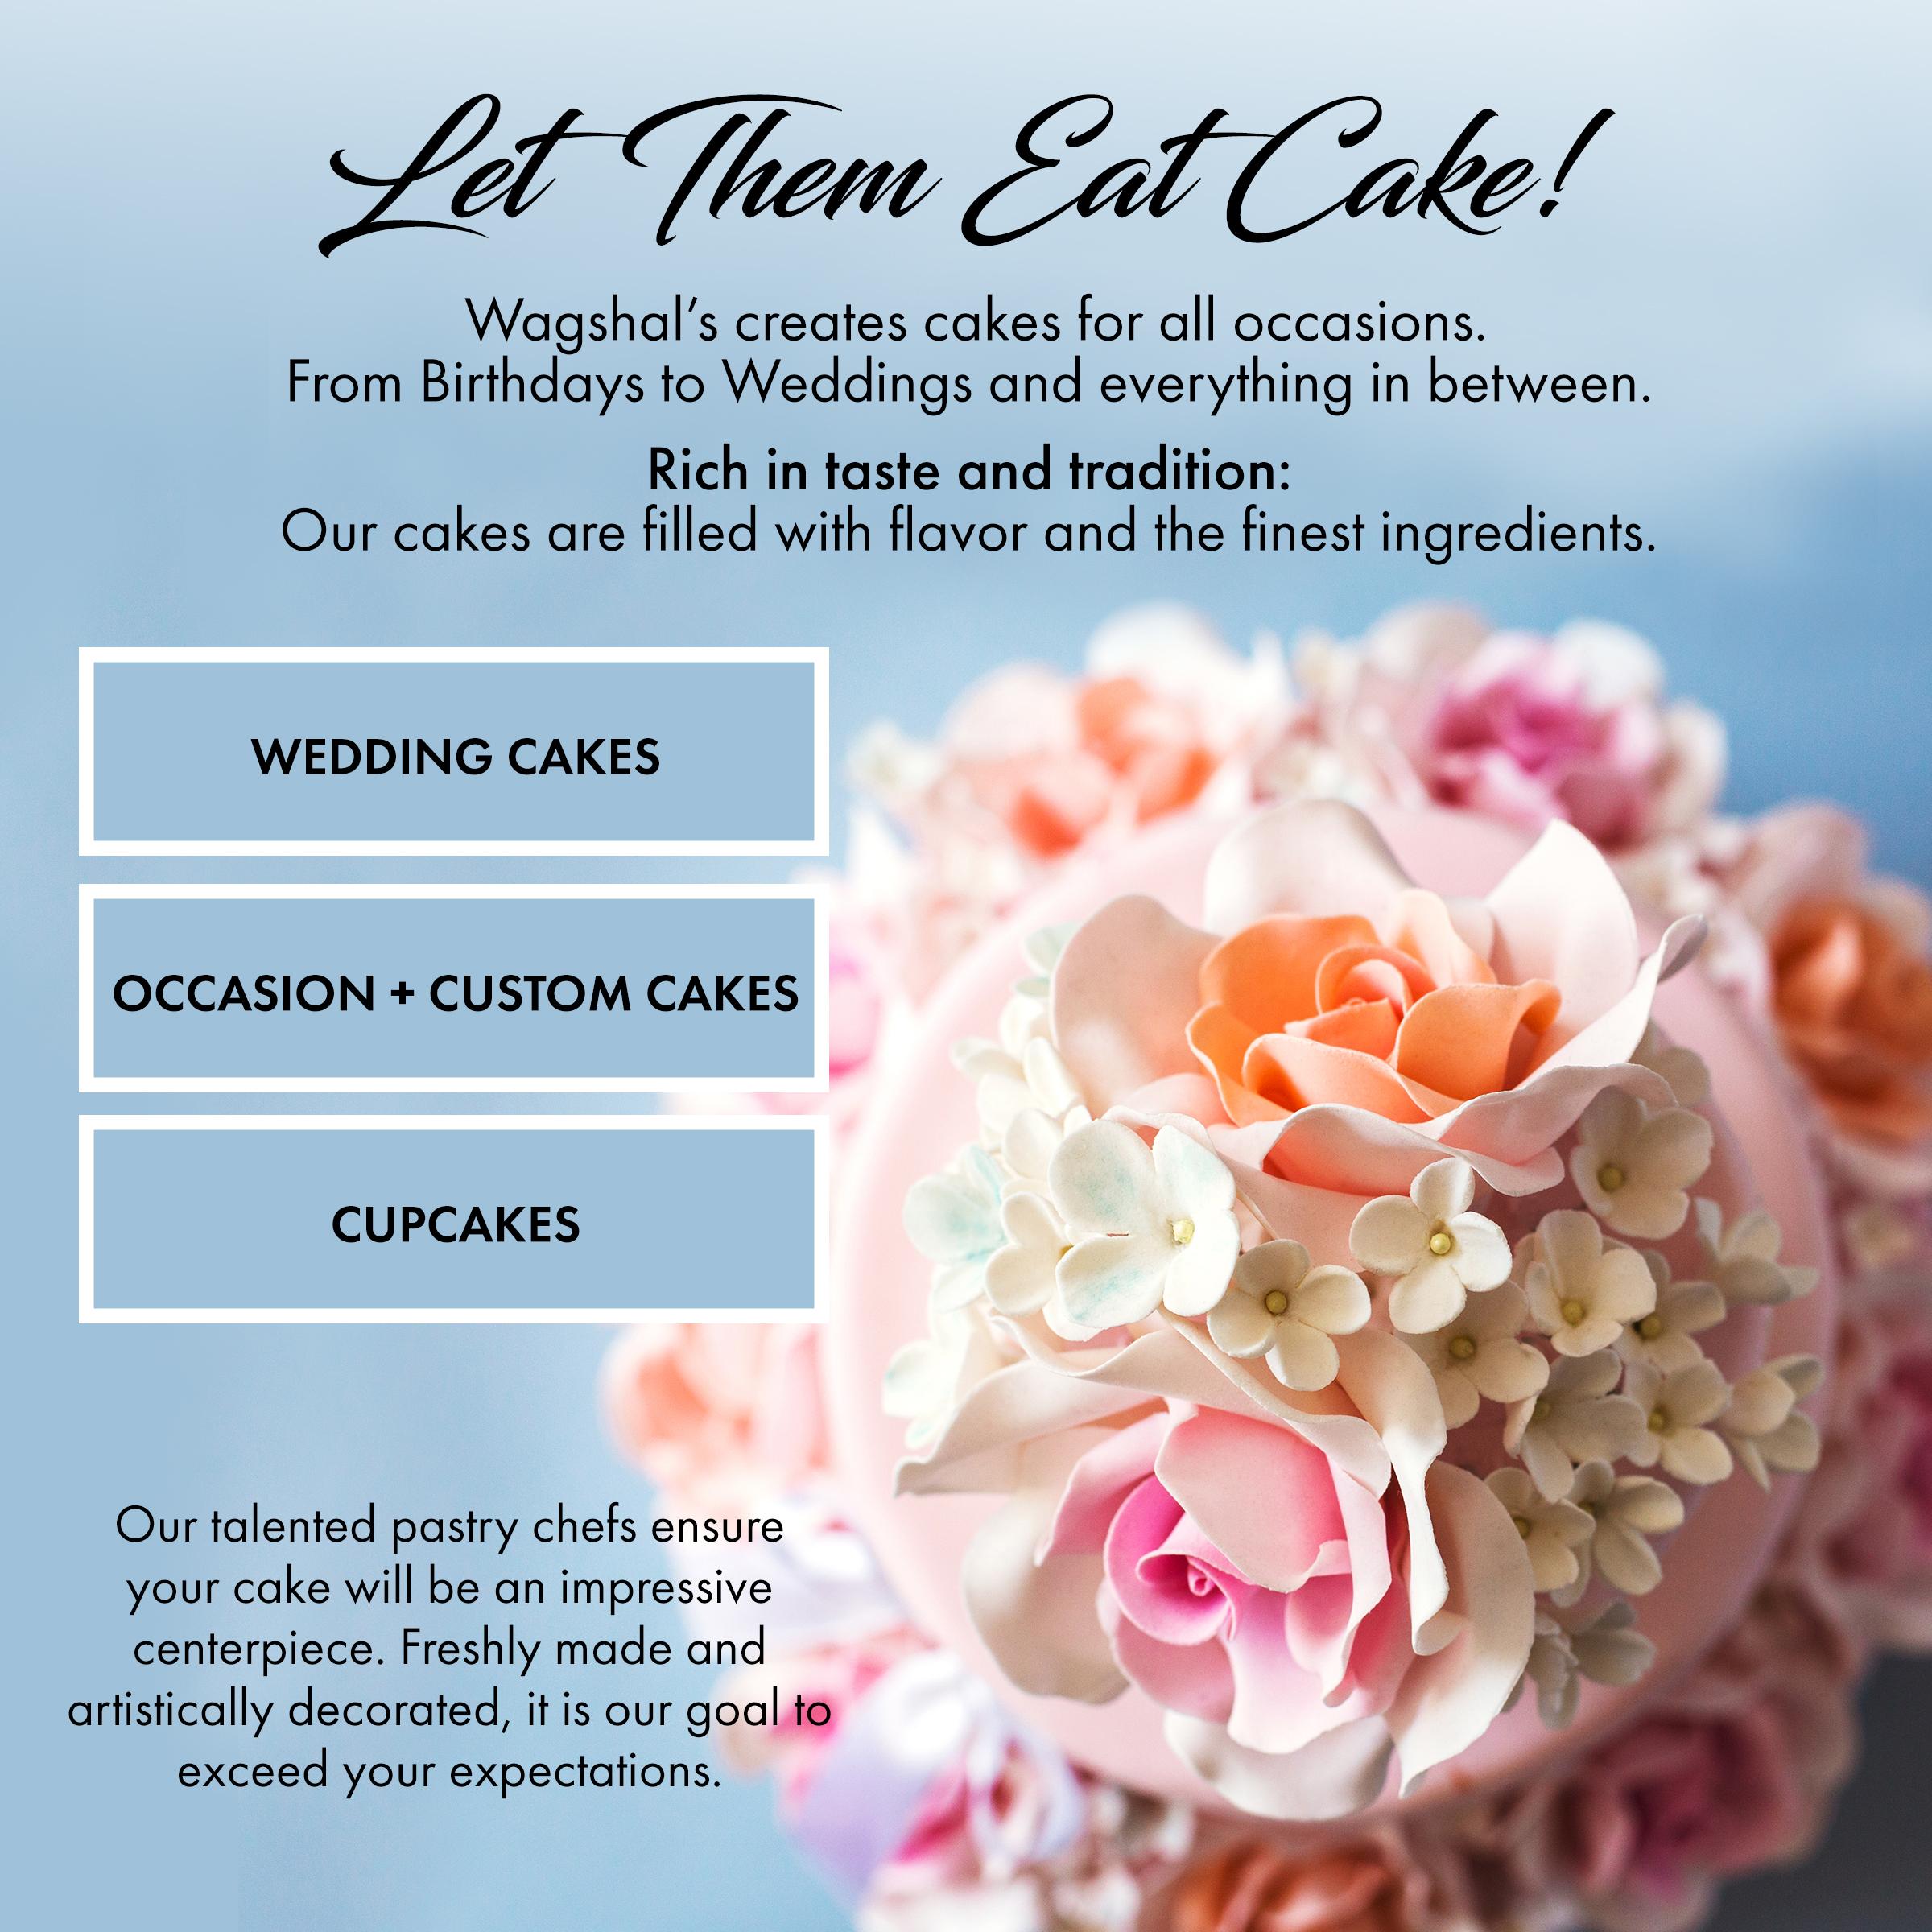 CAKE LOYALTY CUSTOMER.jpg